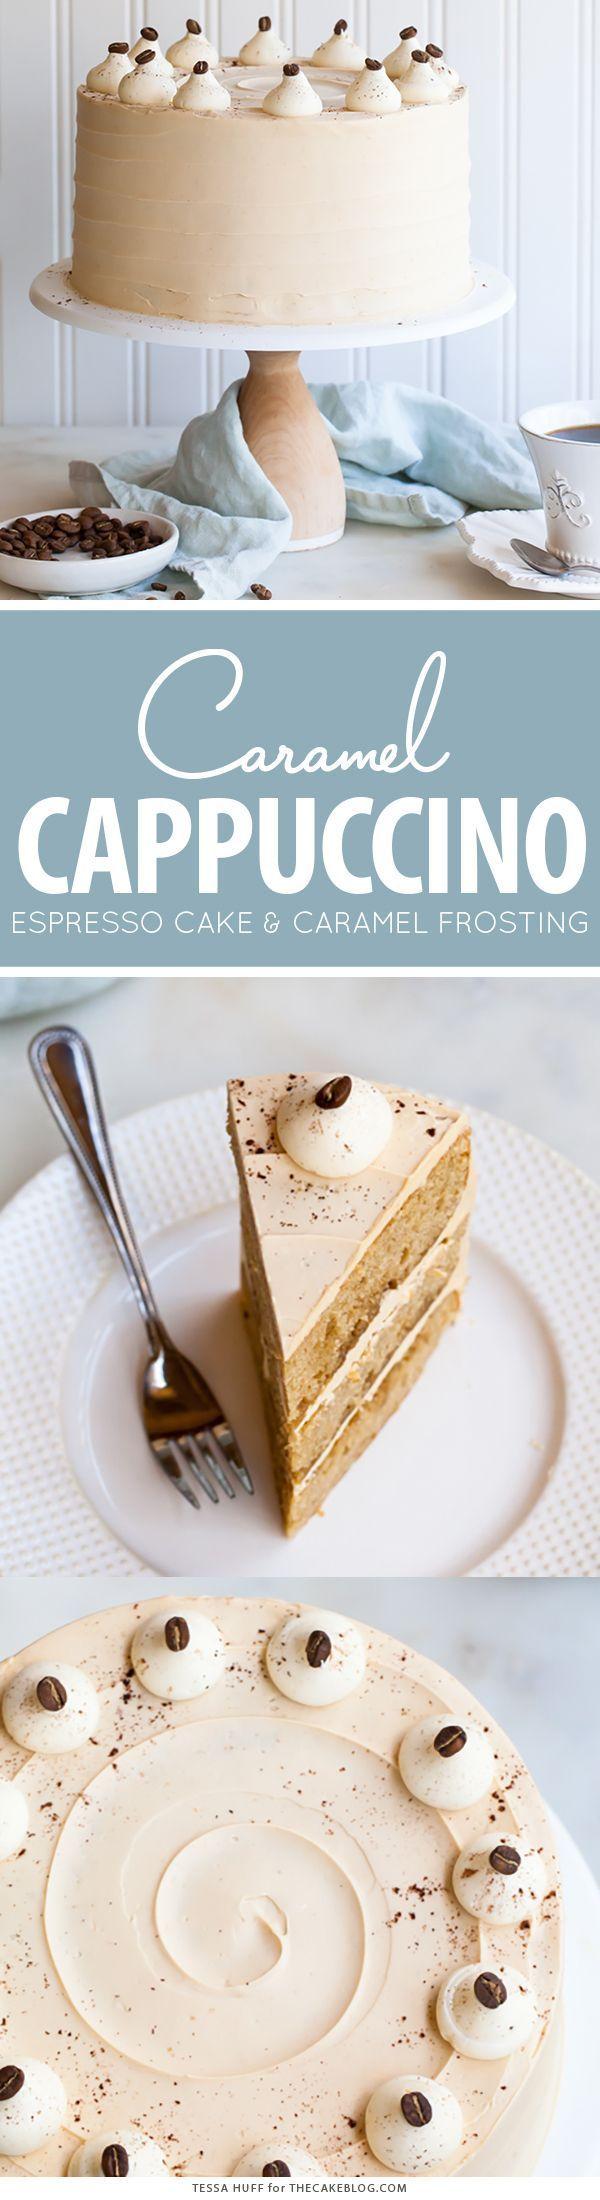 Caramel Cappuccino Cake Recipe Cake Flavors Desserts Homemade Cakes